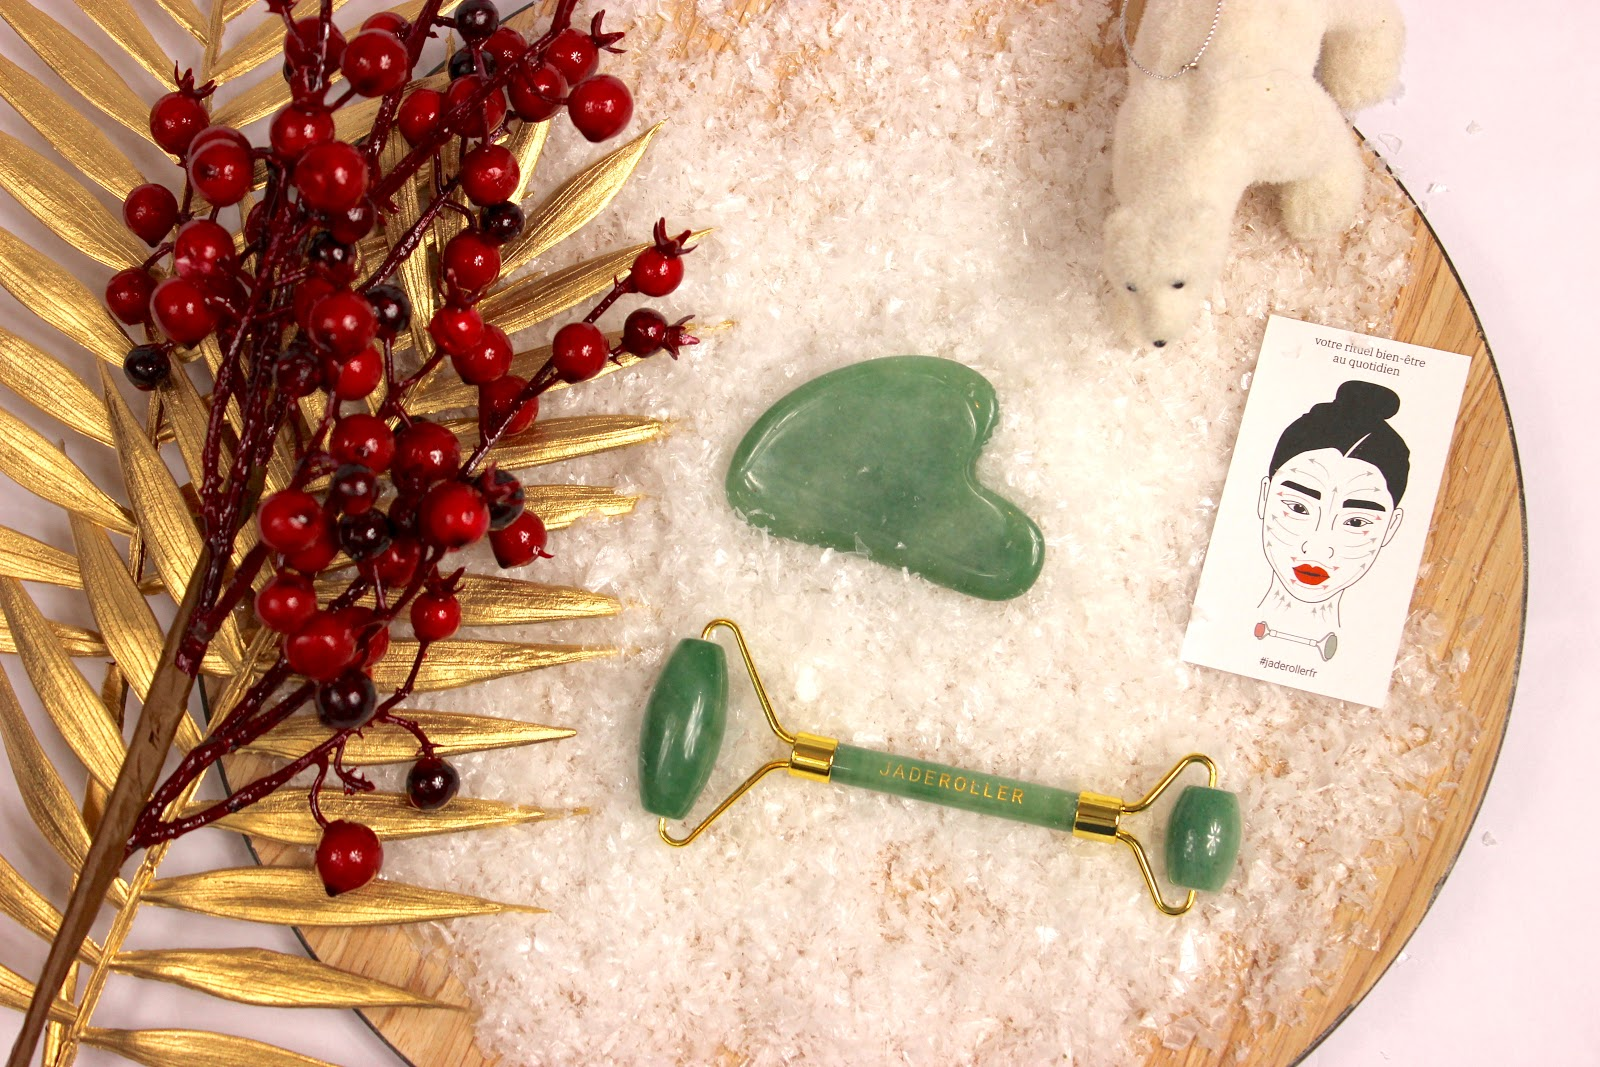 rouleau de jade, jade roller, rituel beauté, les petites bulles de ma vie